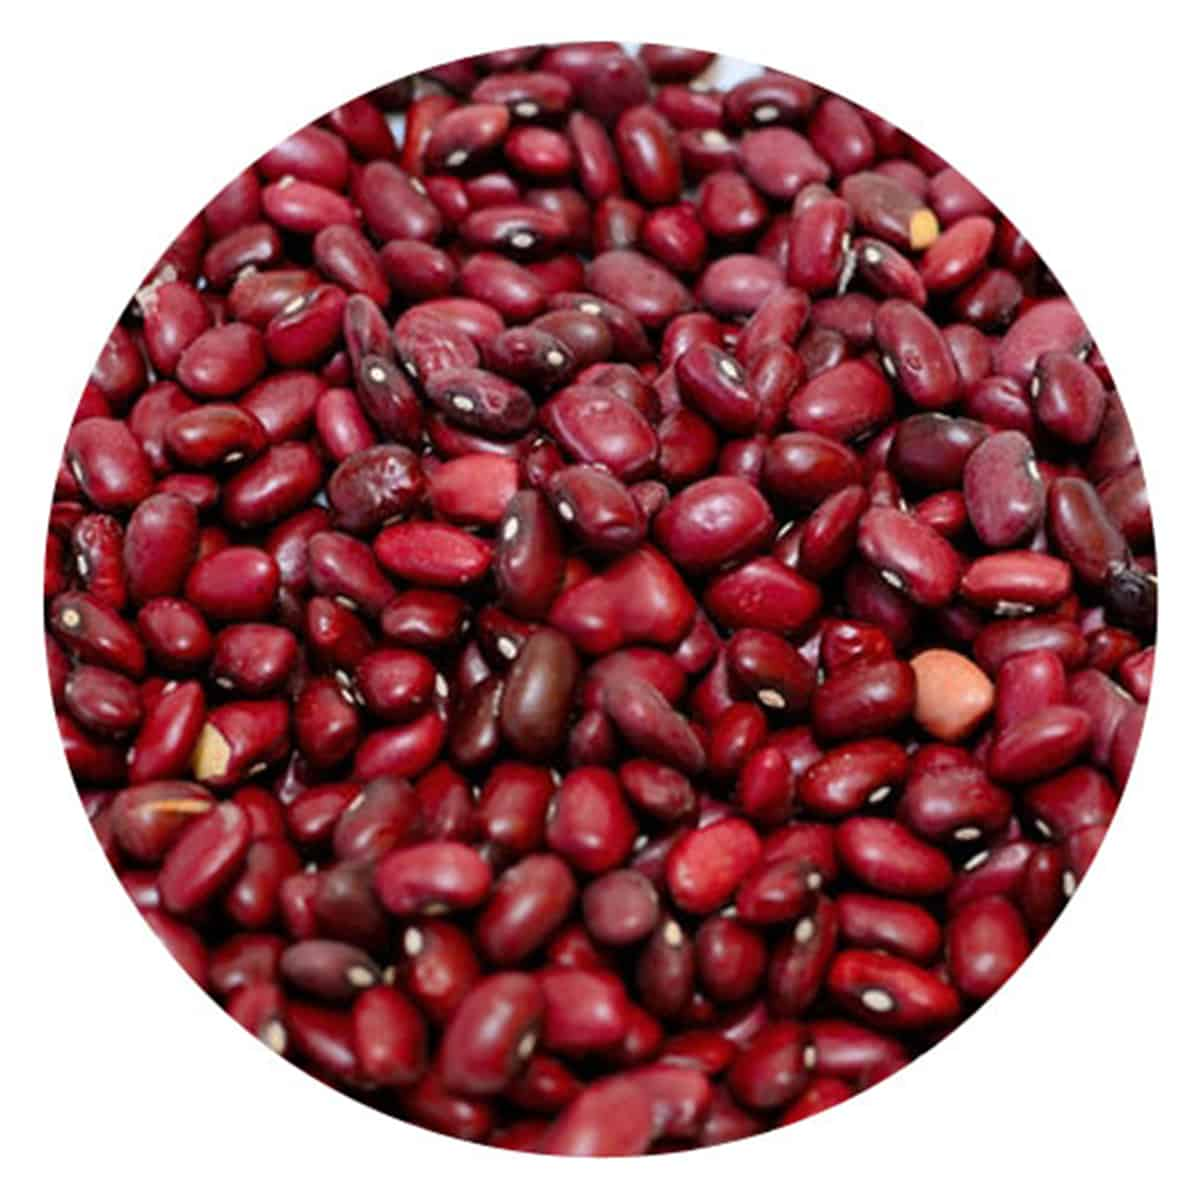 Buy IAG Foods Dried Adzuki Beans - 1 kg